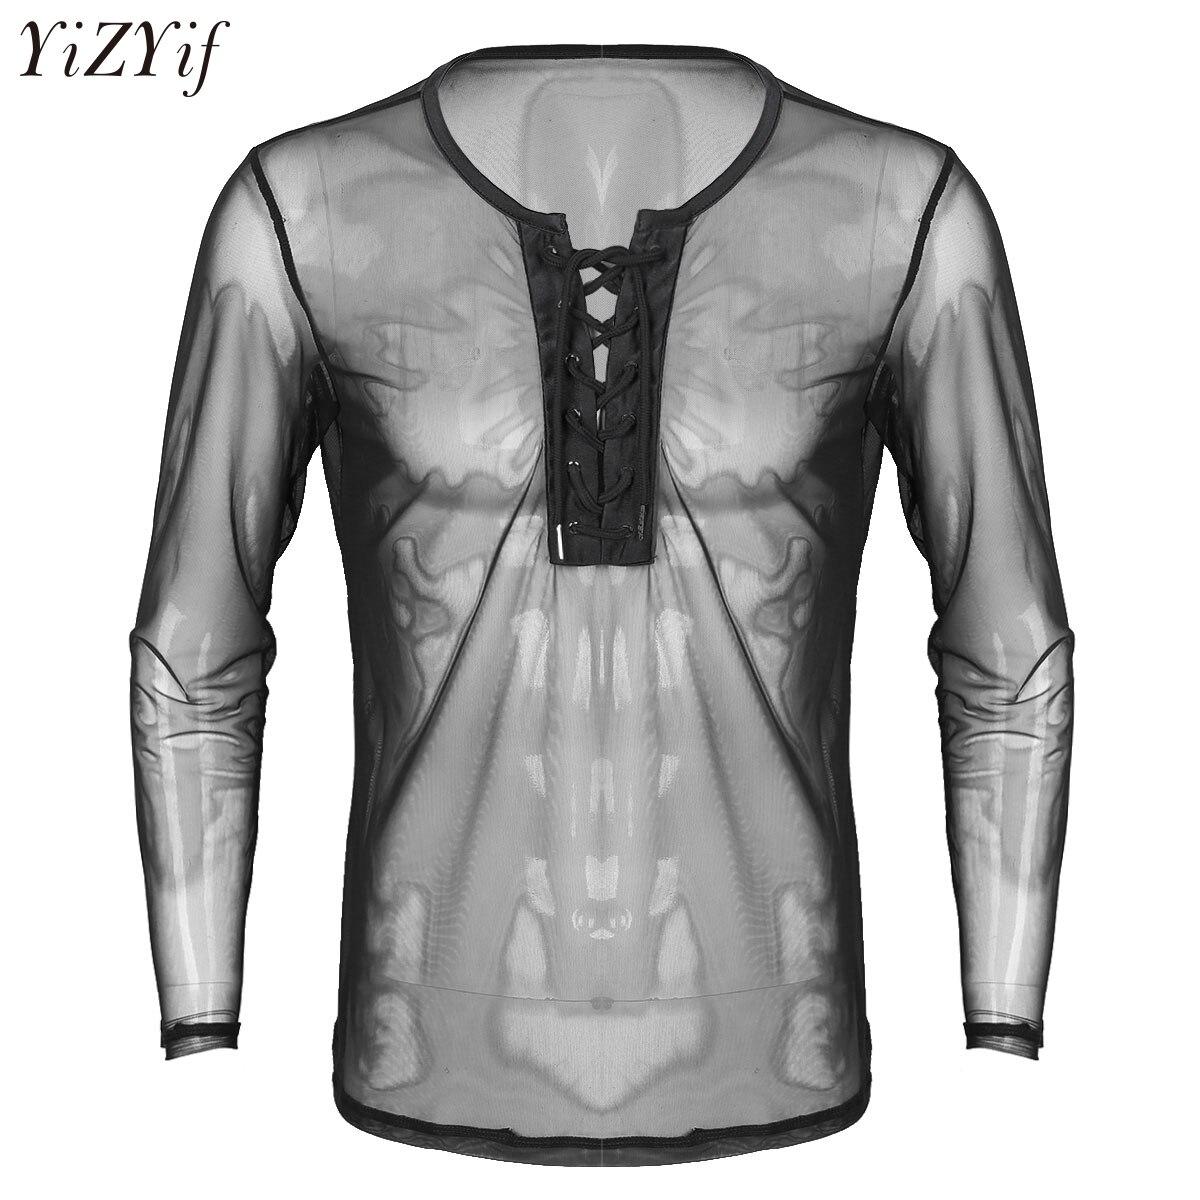 YiZYiF Mens Sexy Lace Up Mesh See Through Long Sleeve T-Shirt Men Sexy Summer Club wear Costumes Undershirts Sheer Fishnet Tops